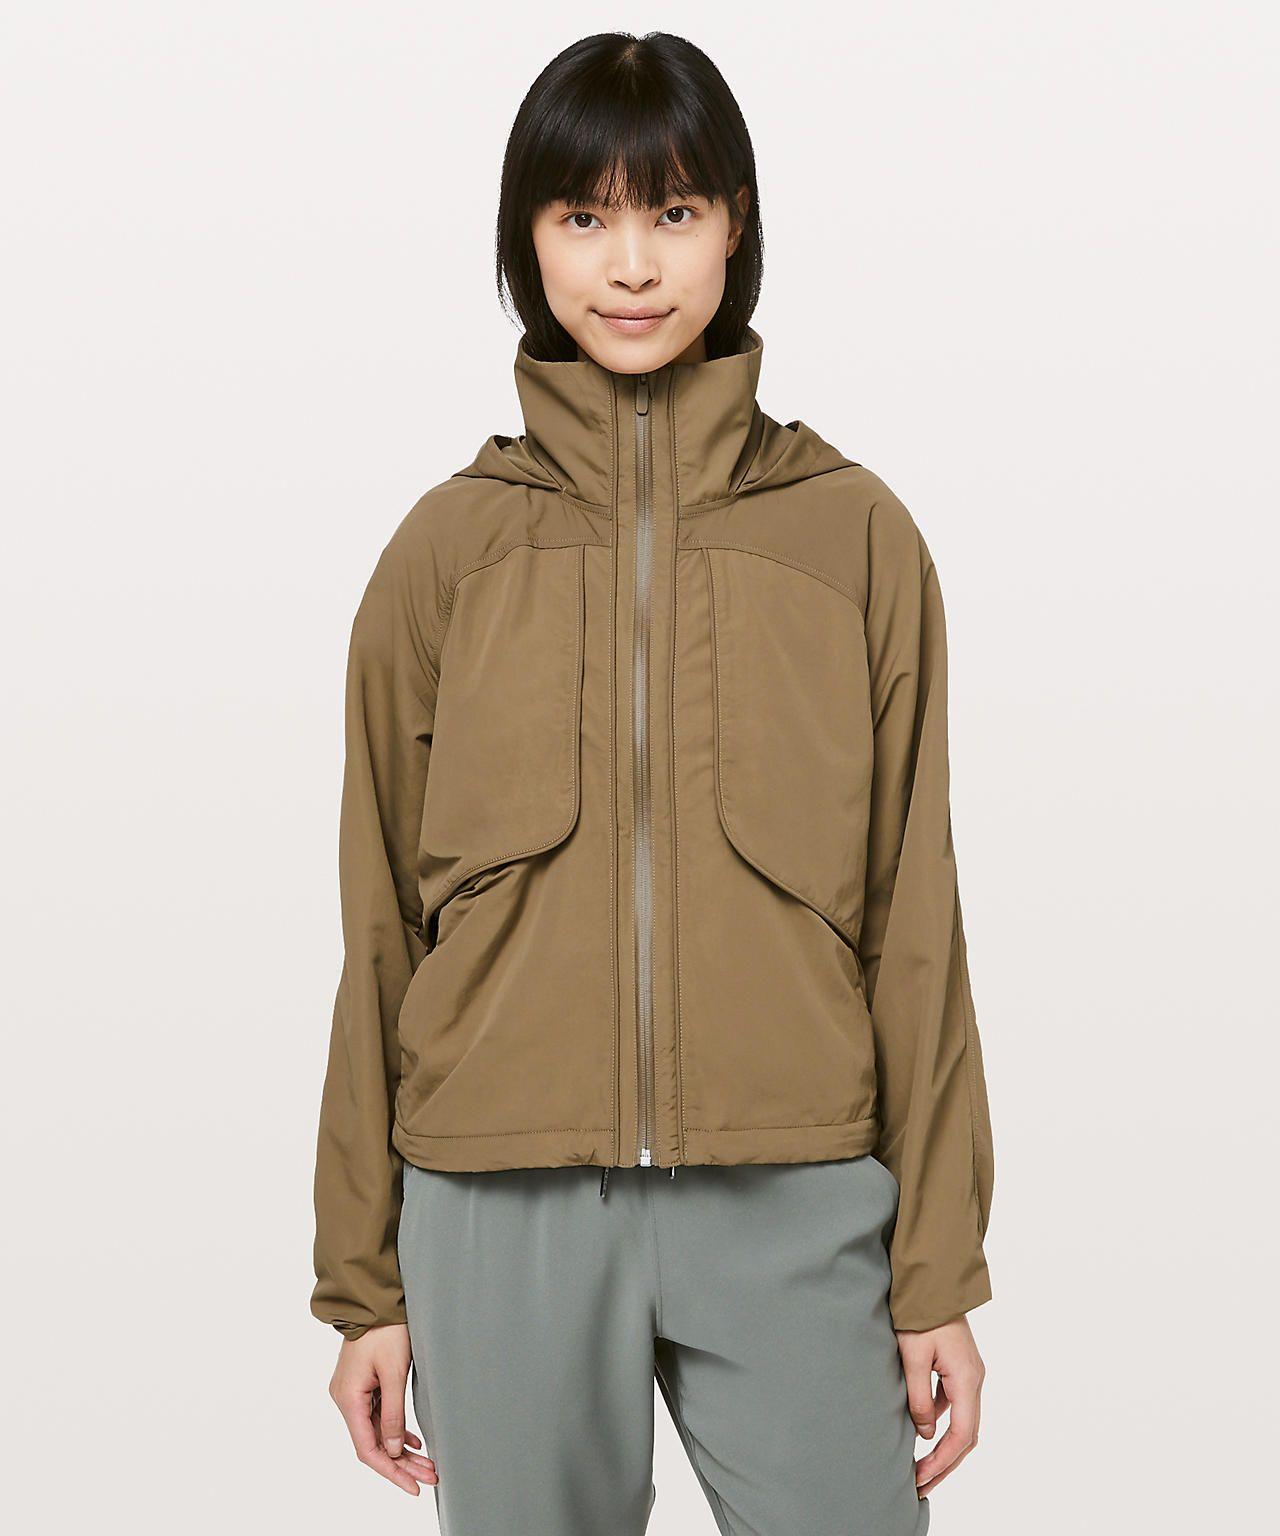 Always Effortless Jacket Women S Jackets Coats Lululemon Jackets For Women Coats Jackets Women Jackets [ 1536 x 1280 Pixel ]